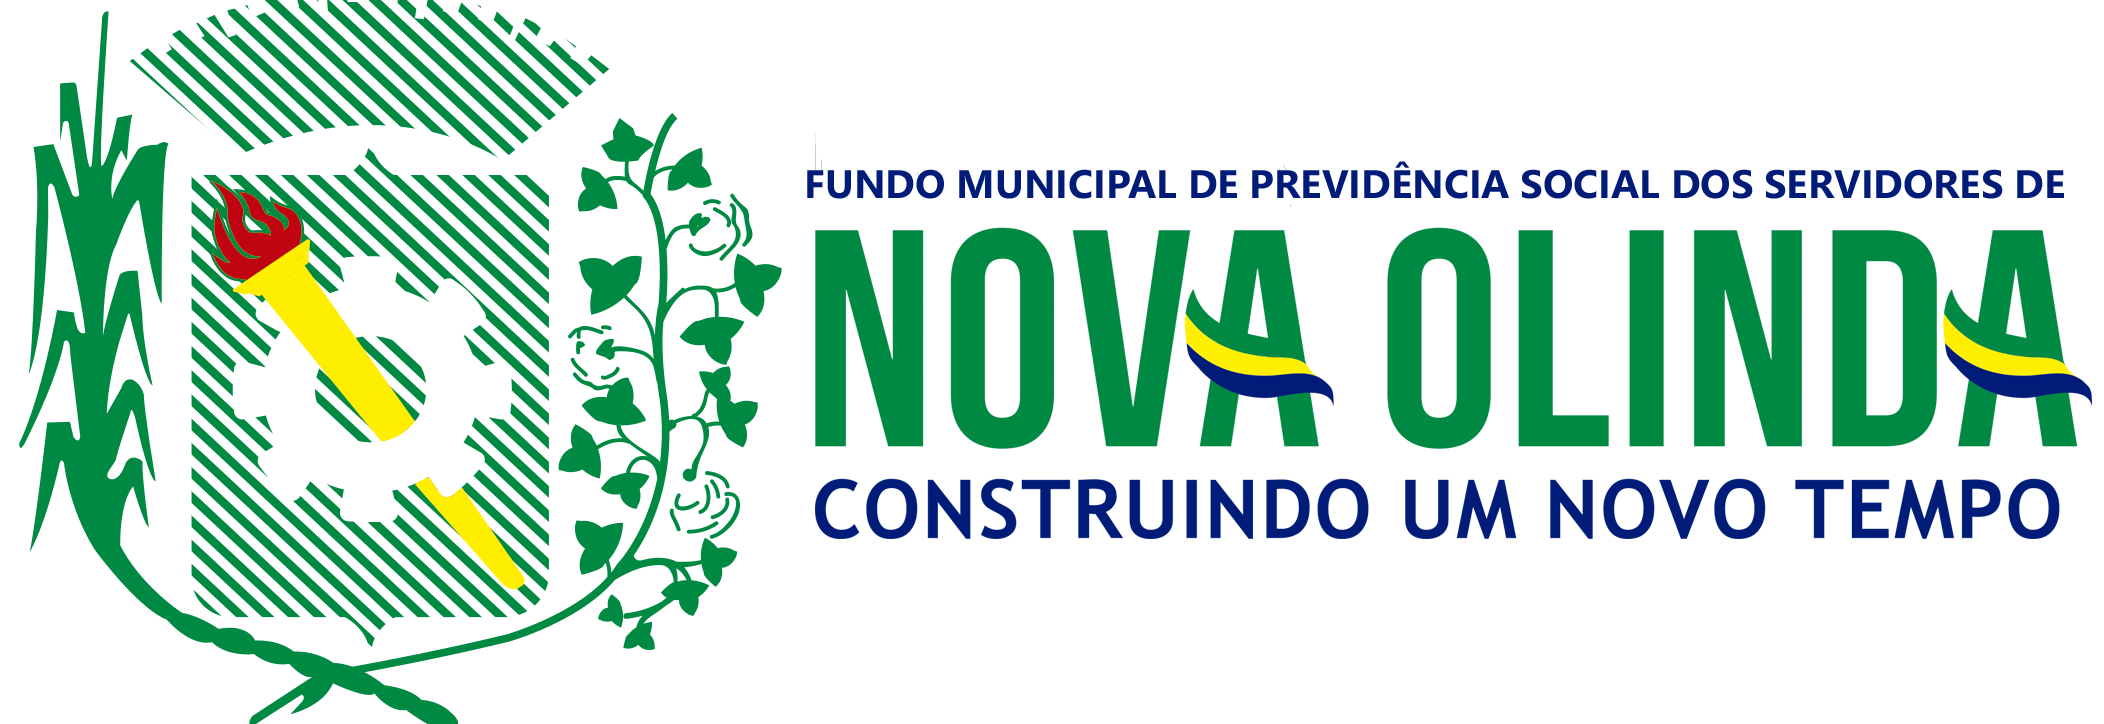 Instituto de Previdência de Nova Olinda